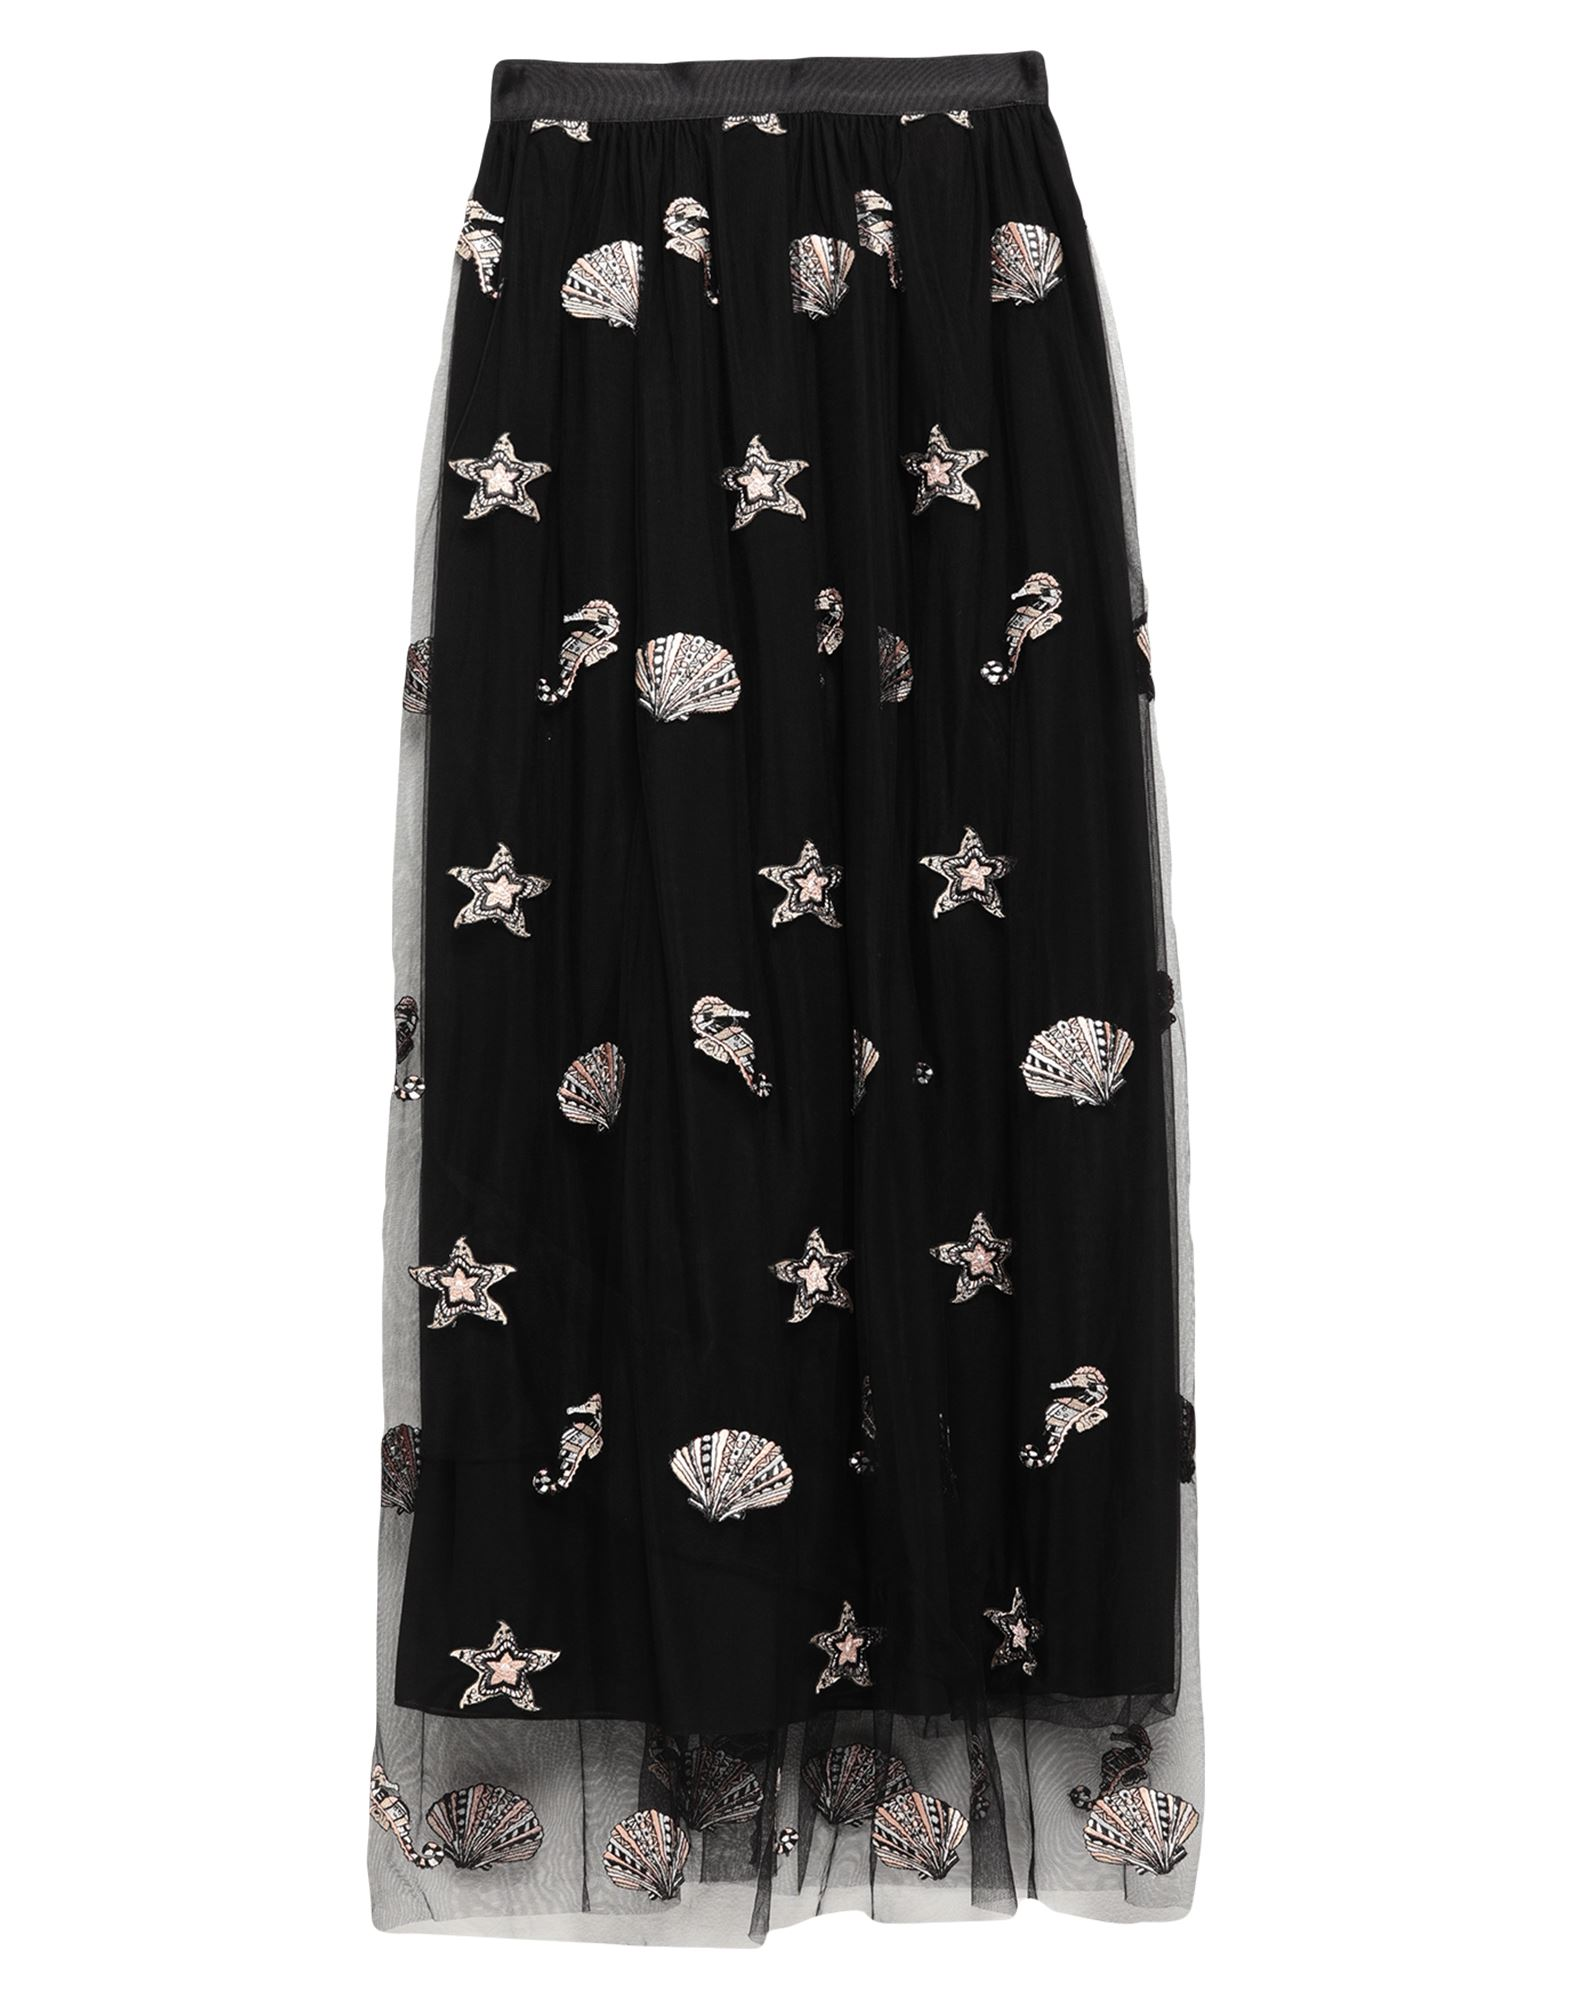 SPACE SIMONA CORSELLINI Длинная юбка space simona corsellini юбка до колена